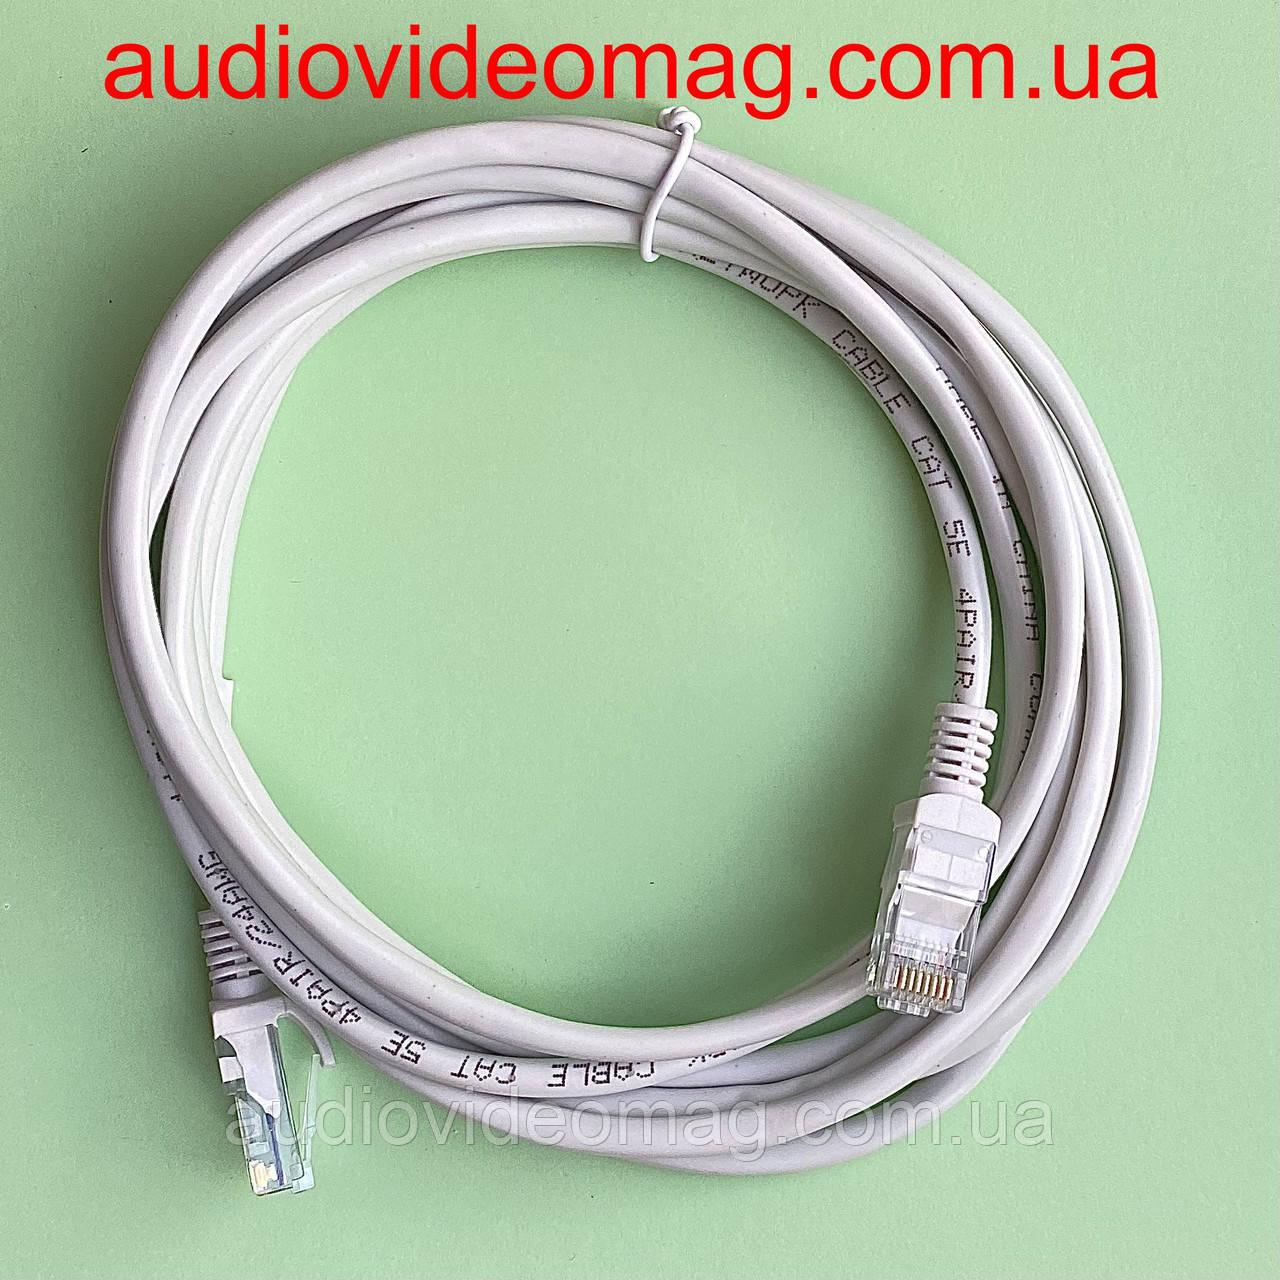 Патч-корд RJ-45 UTP 5e 3 метра интернет-кабель